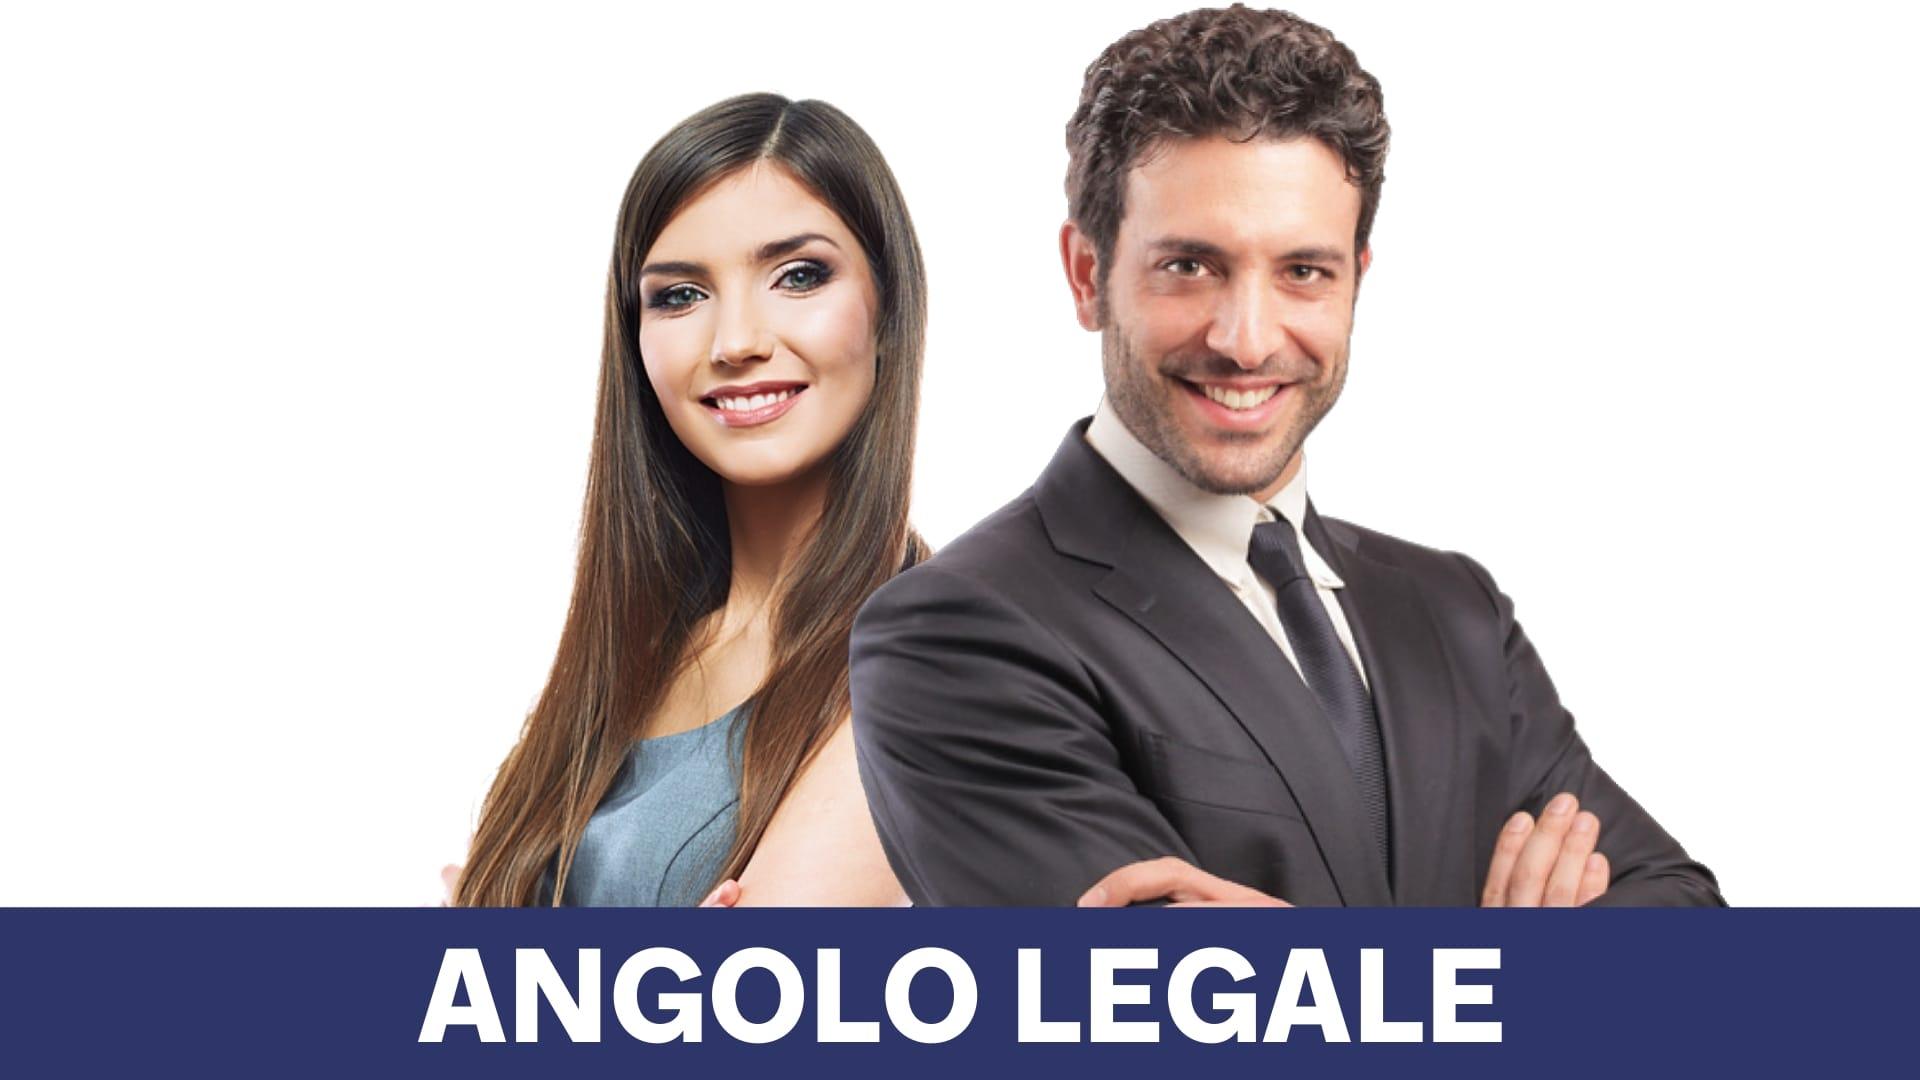 Angolo Legale FIAP  v9